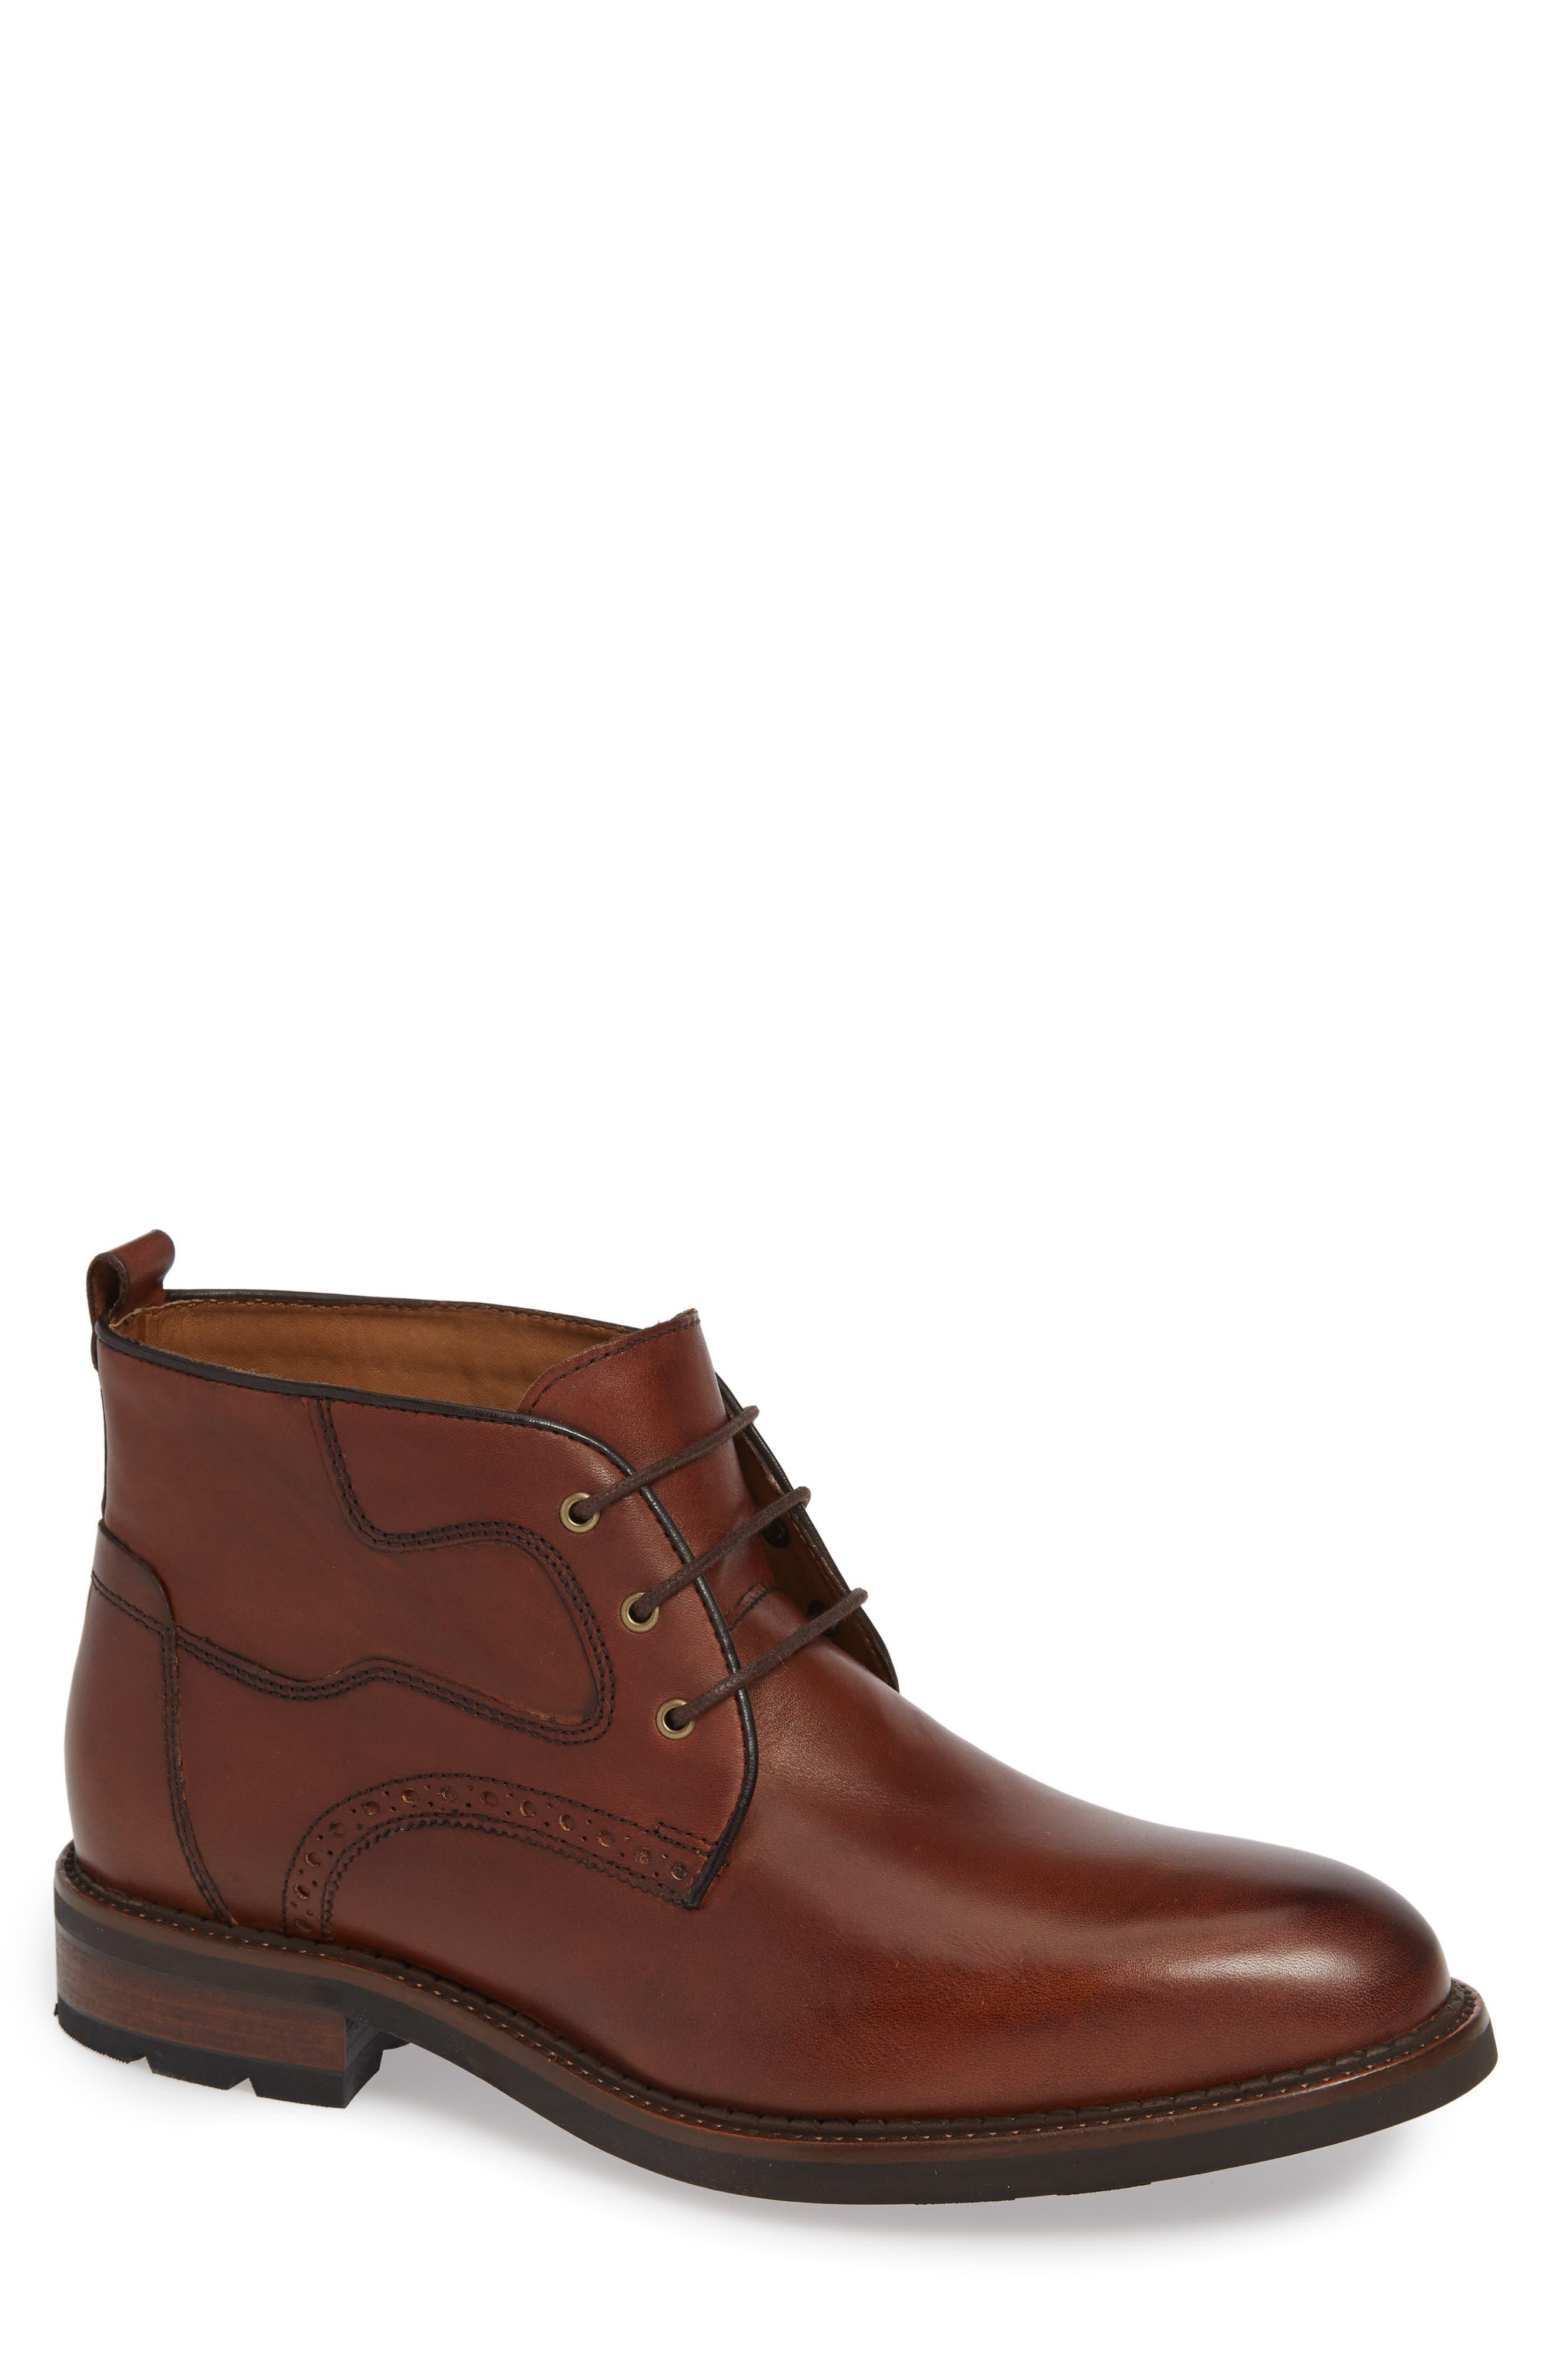 J & m 1850 Fullerton Chukka Boot- Brown